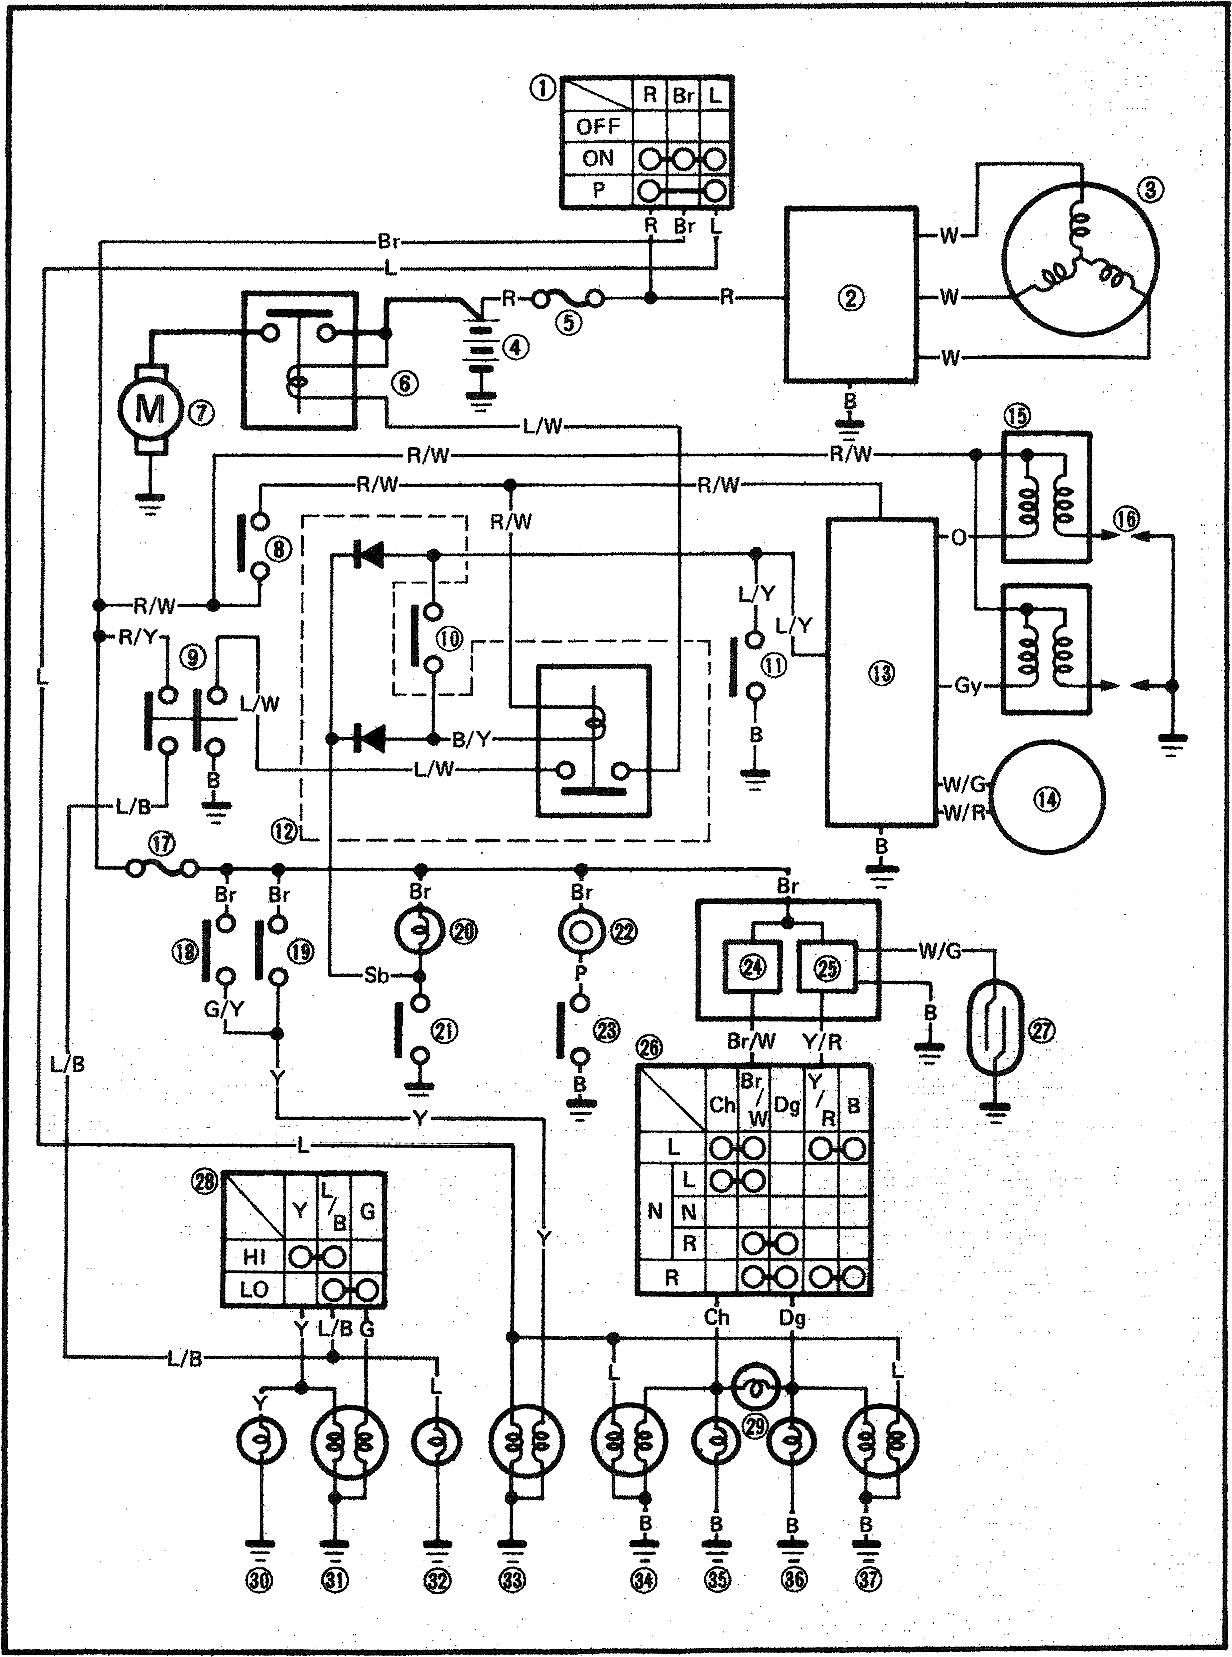 Yamaha Virago 250 Wiring Diagram : 2004 Yamaha Virago 250